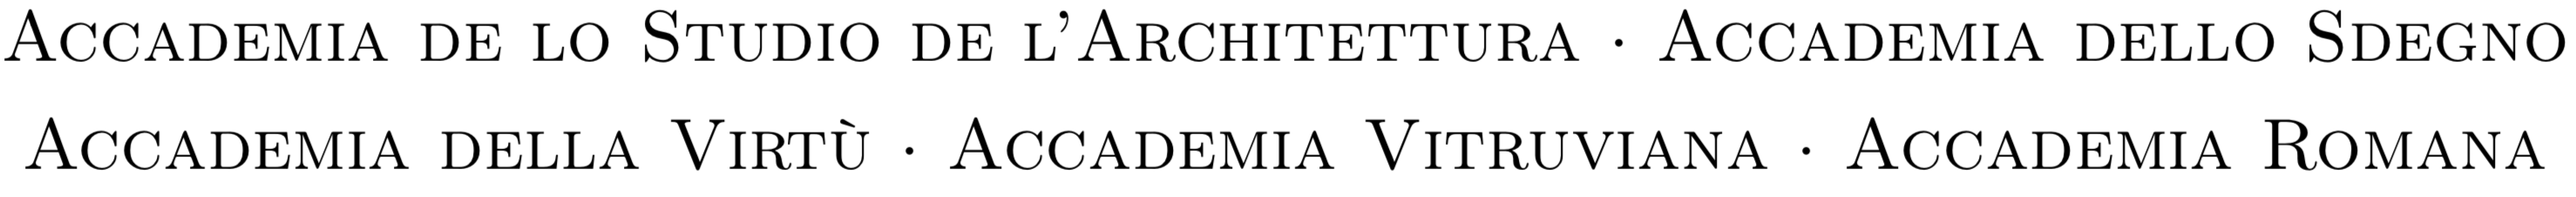 Accademia Vitruviana